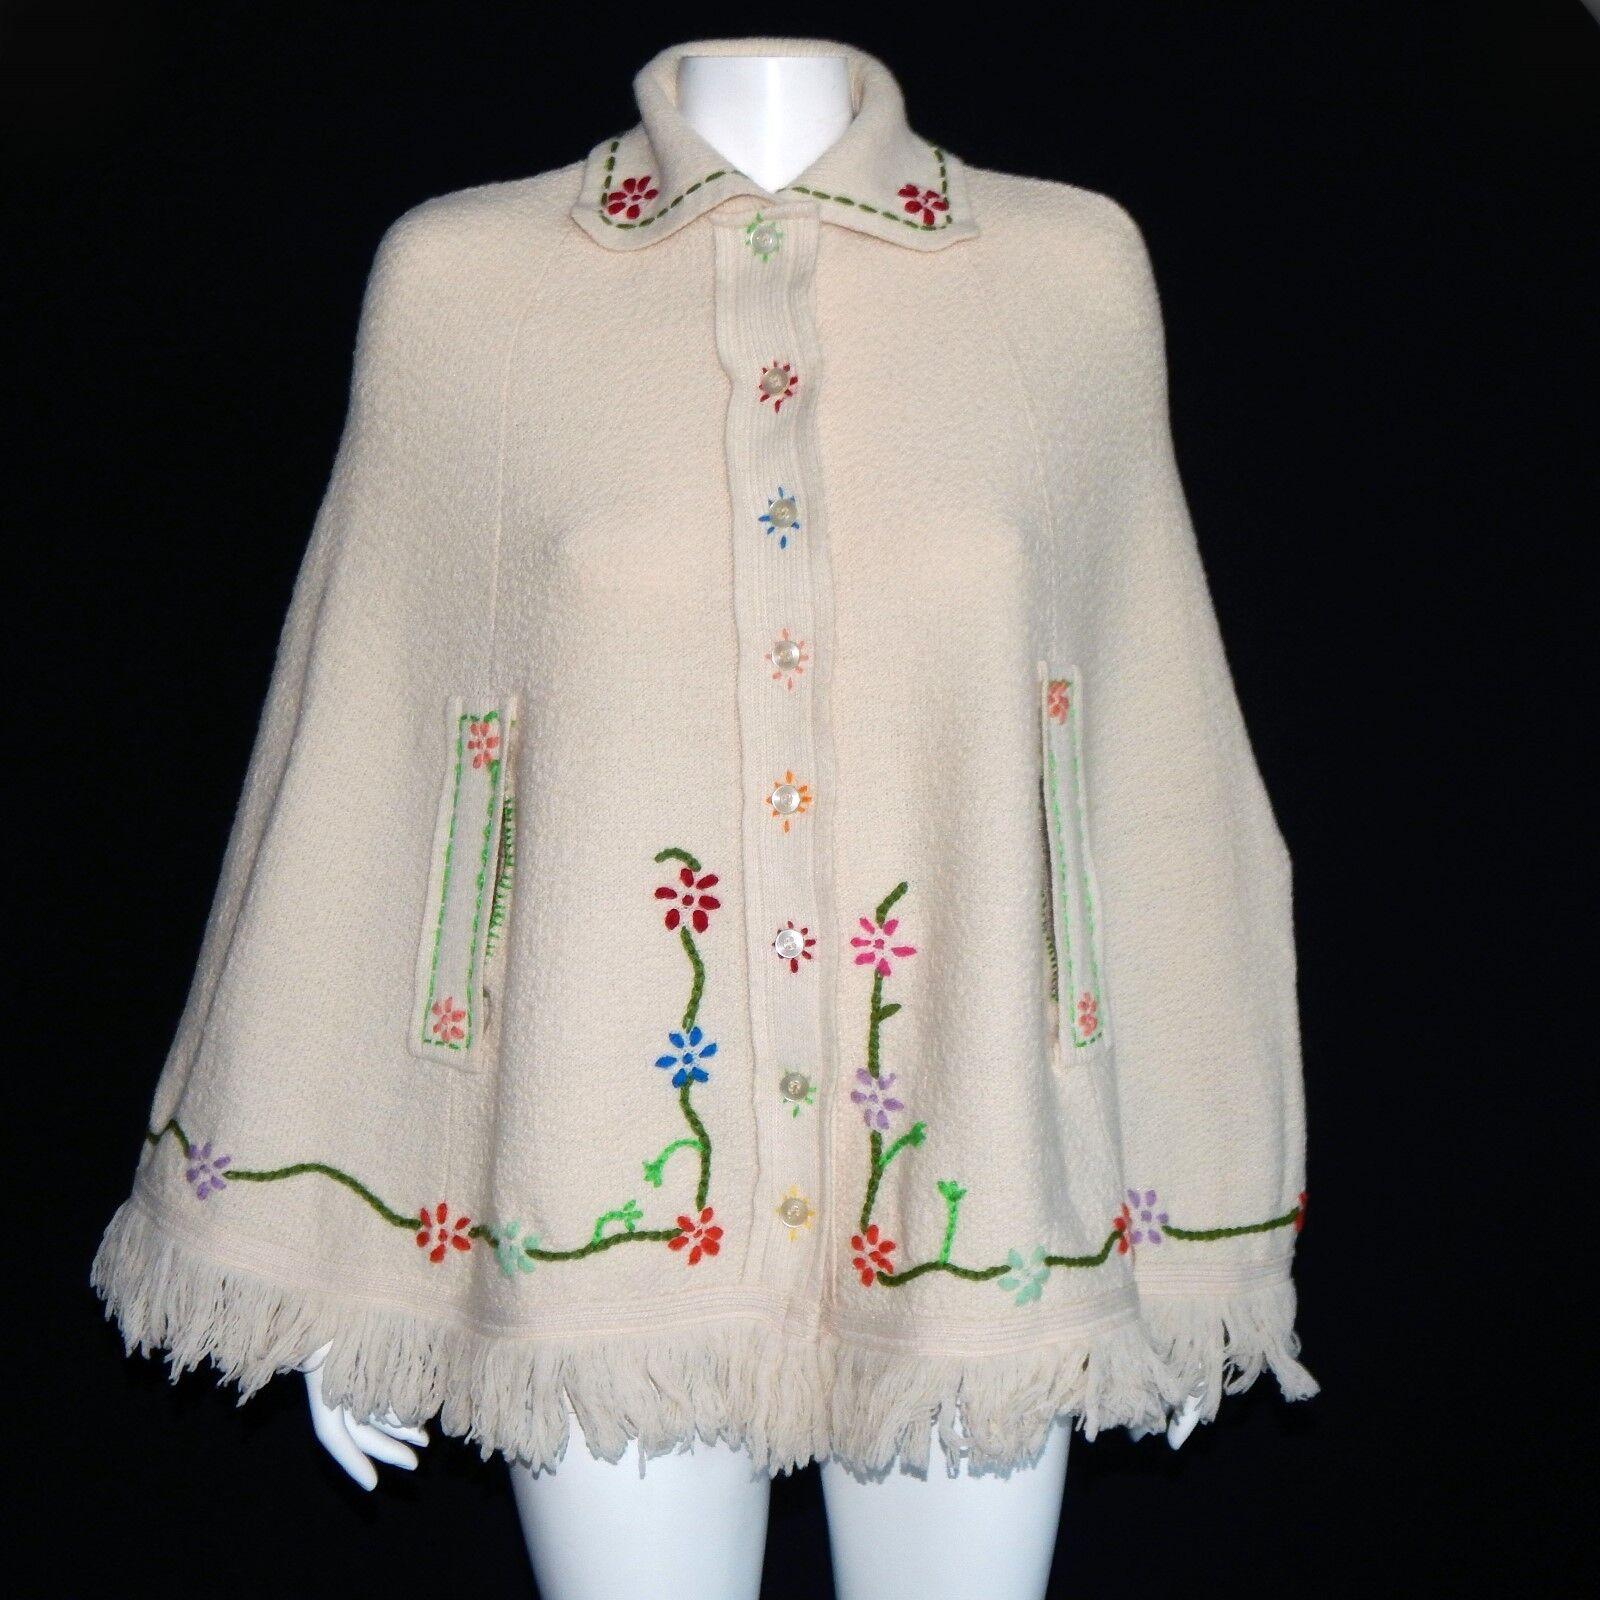 SWEETREE Whimsical Boho Embroidered Poncho Shawl Rainbow Floral -INV1618